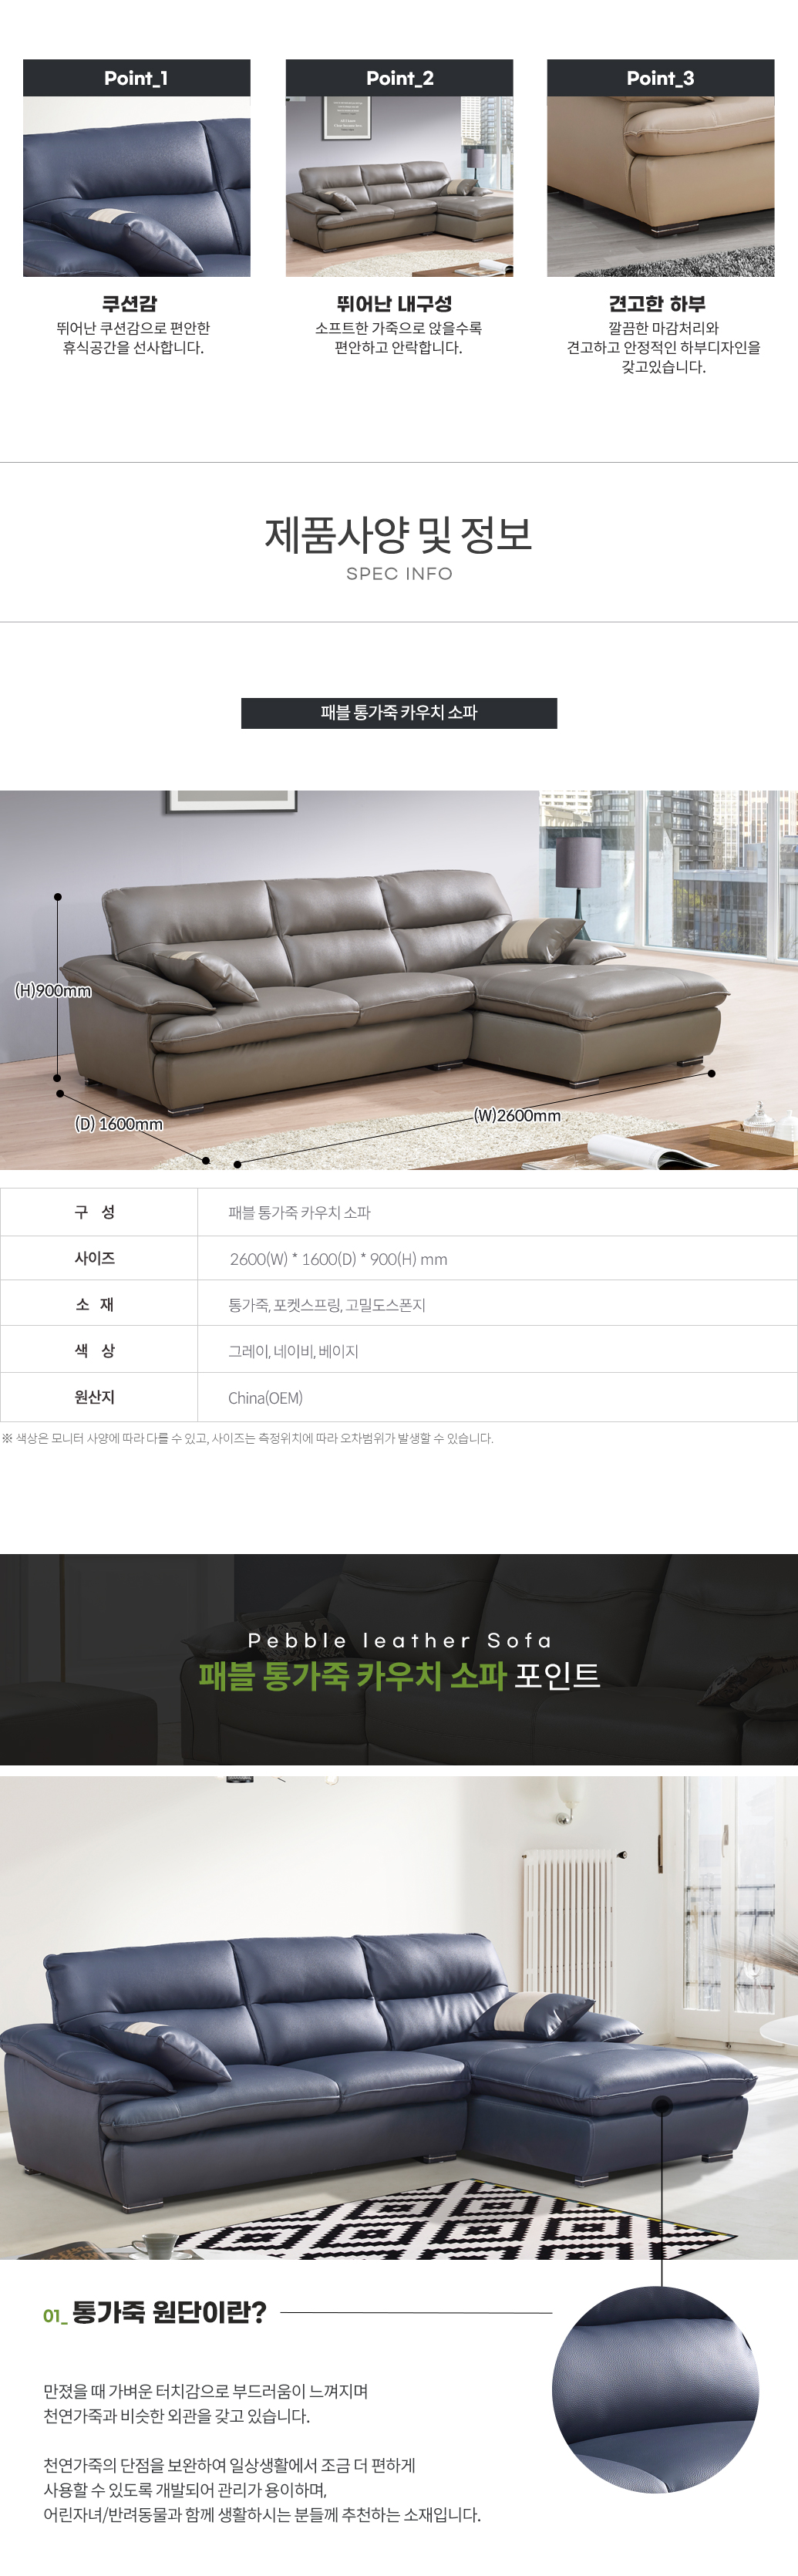 Pebble_couch_02.jpg